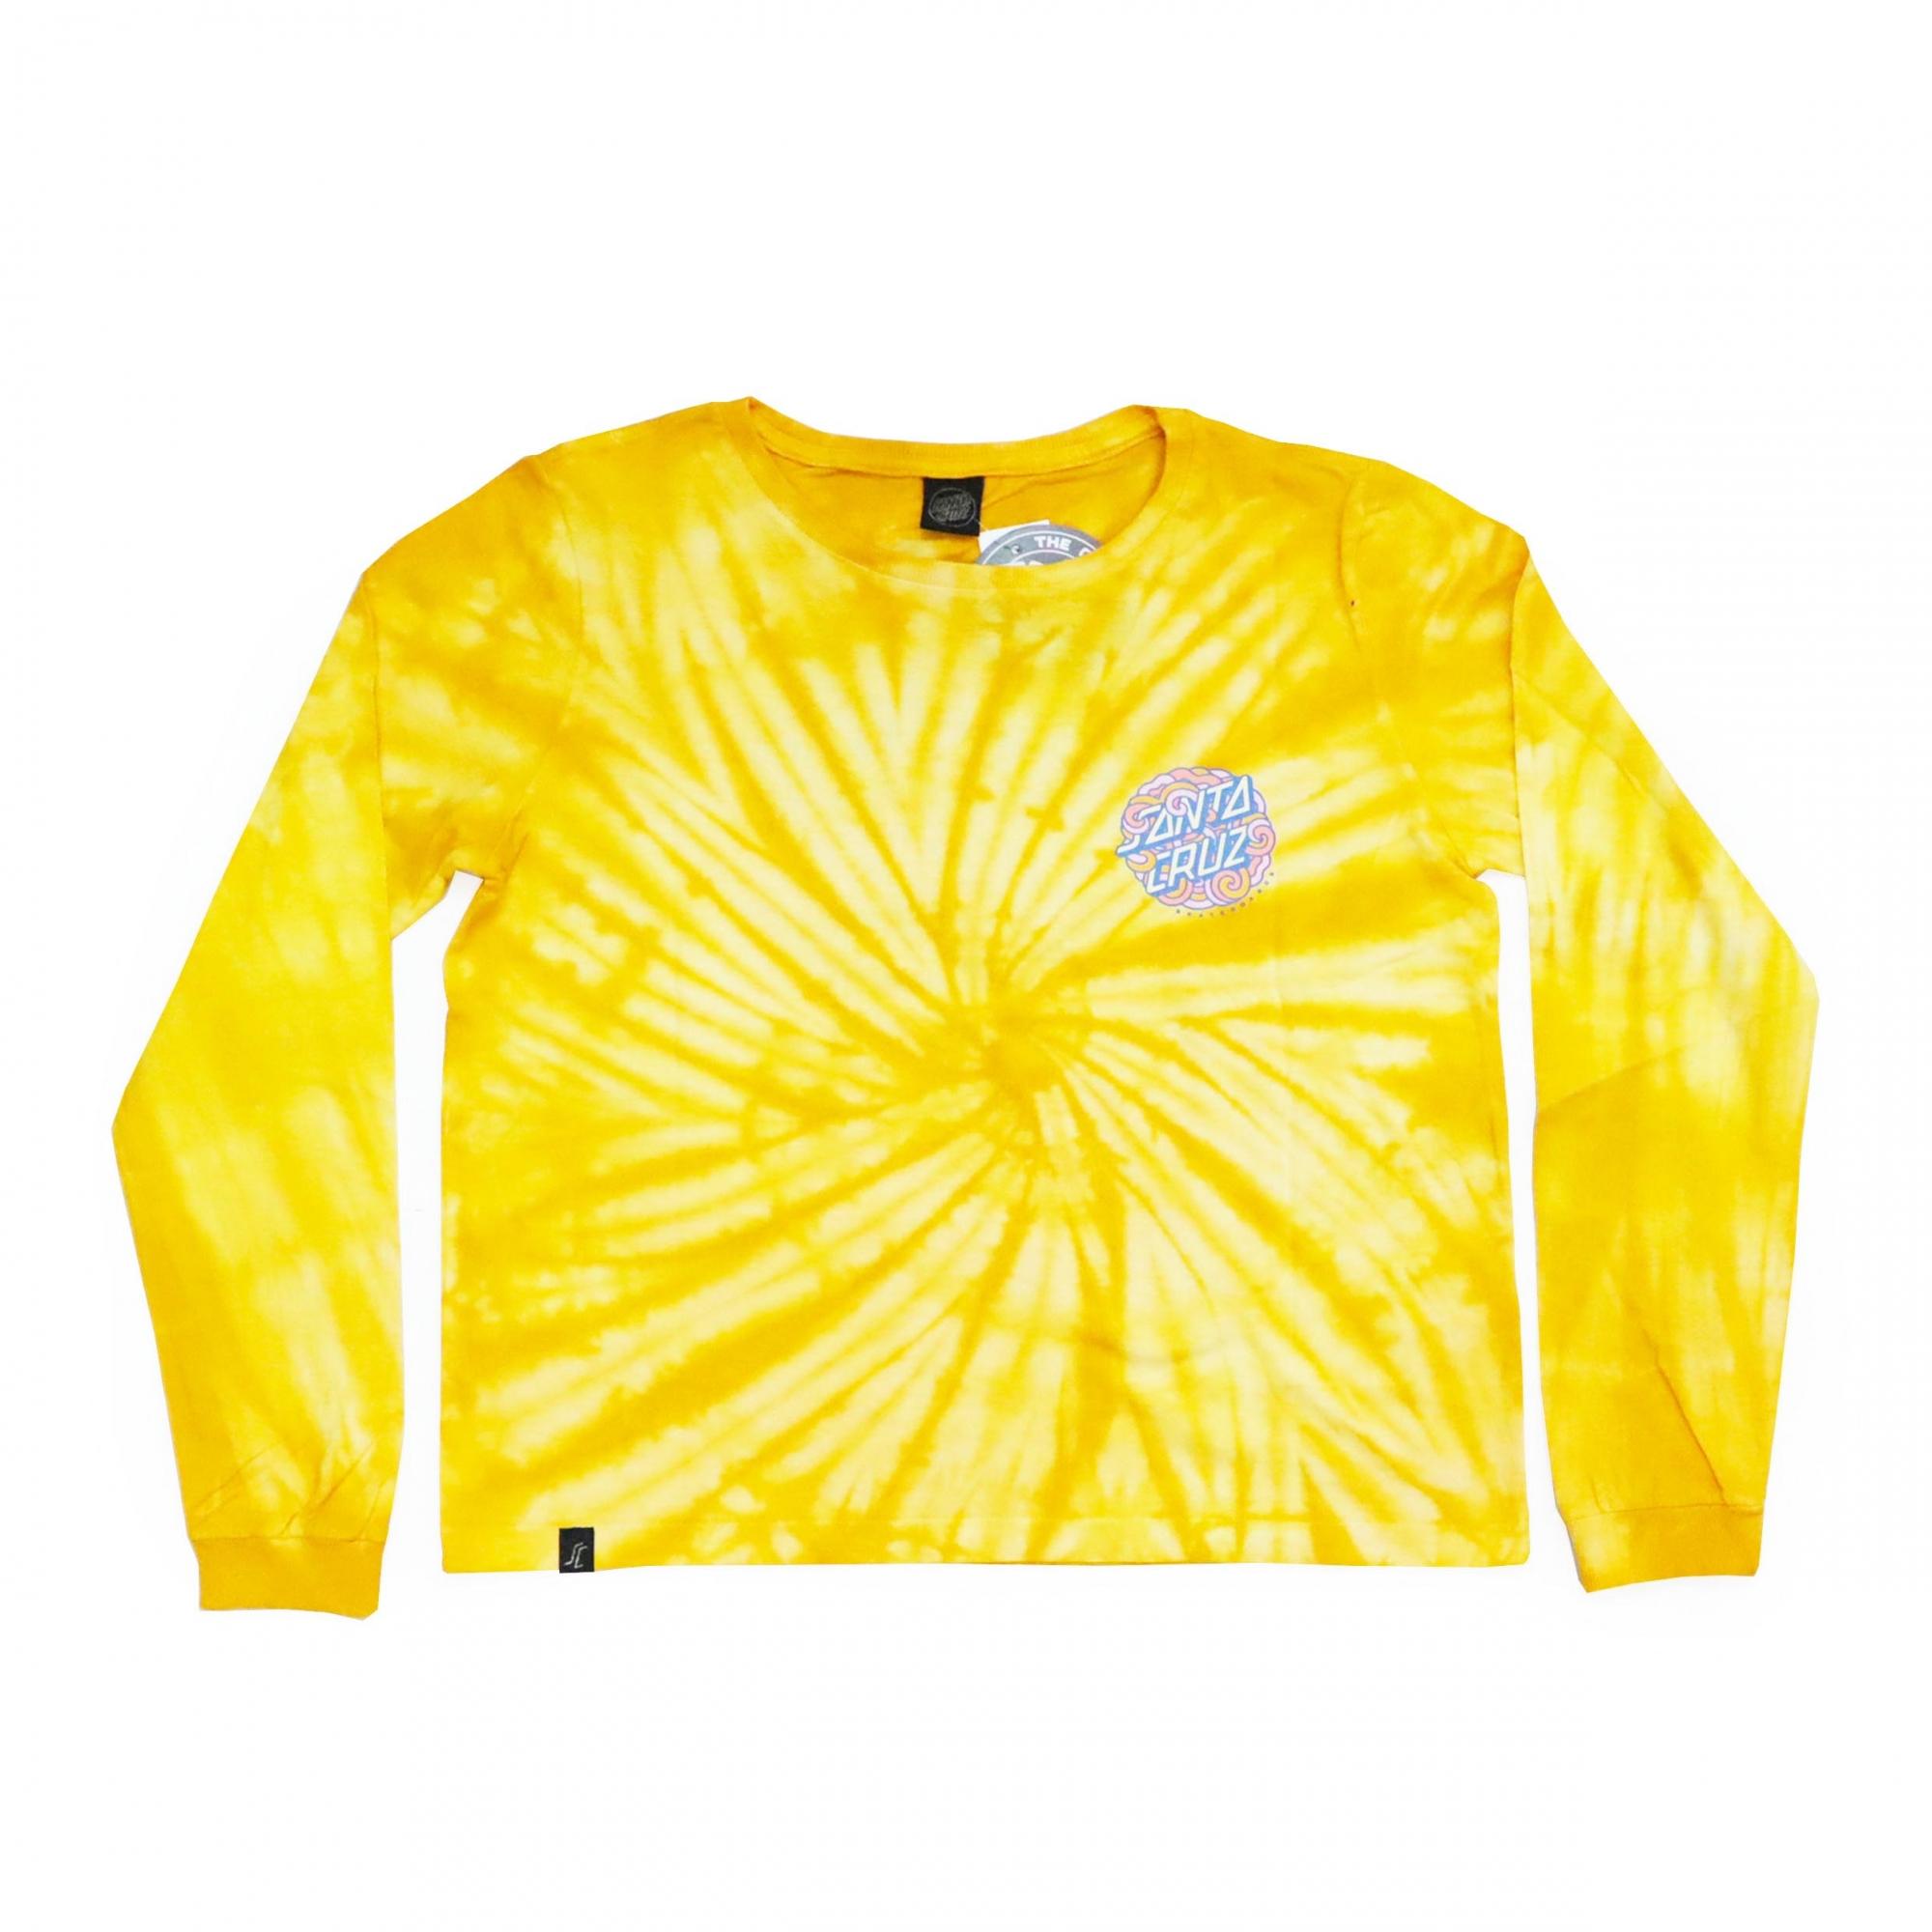 Camiseta Manga Longa Feminina Santa Cruz Funky Dot - Amarelo